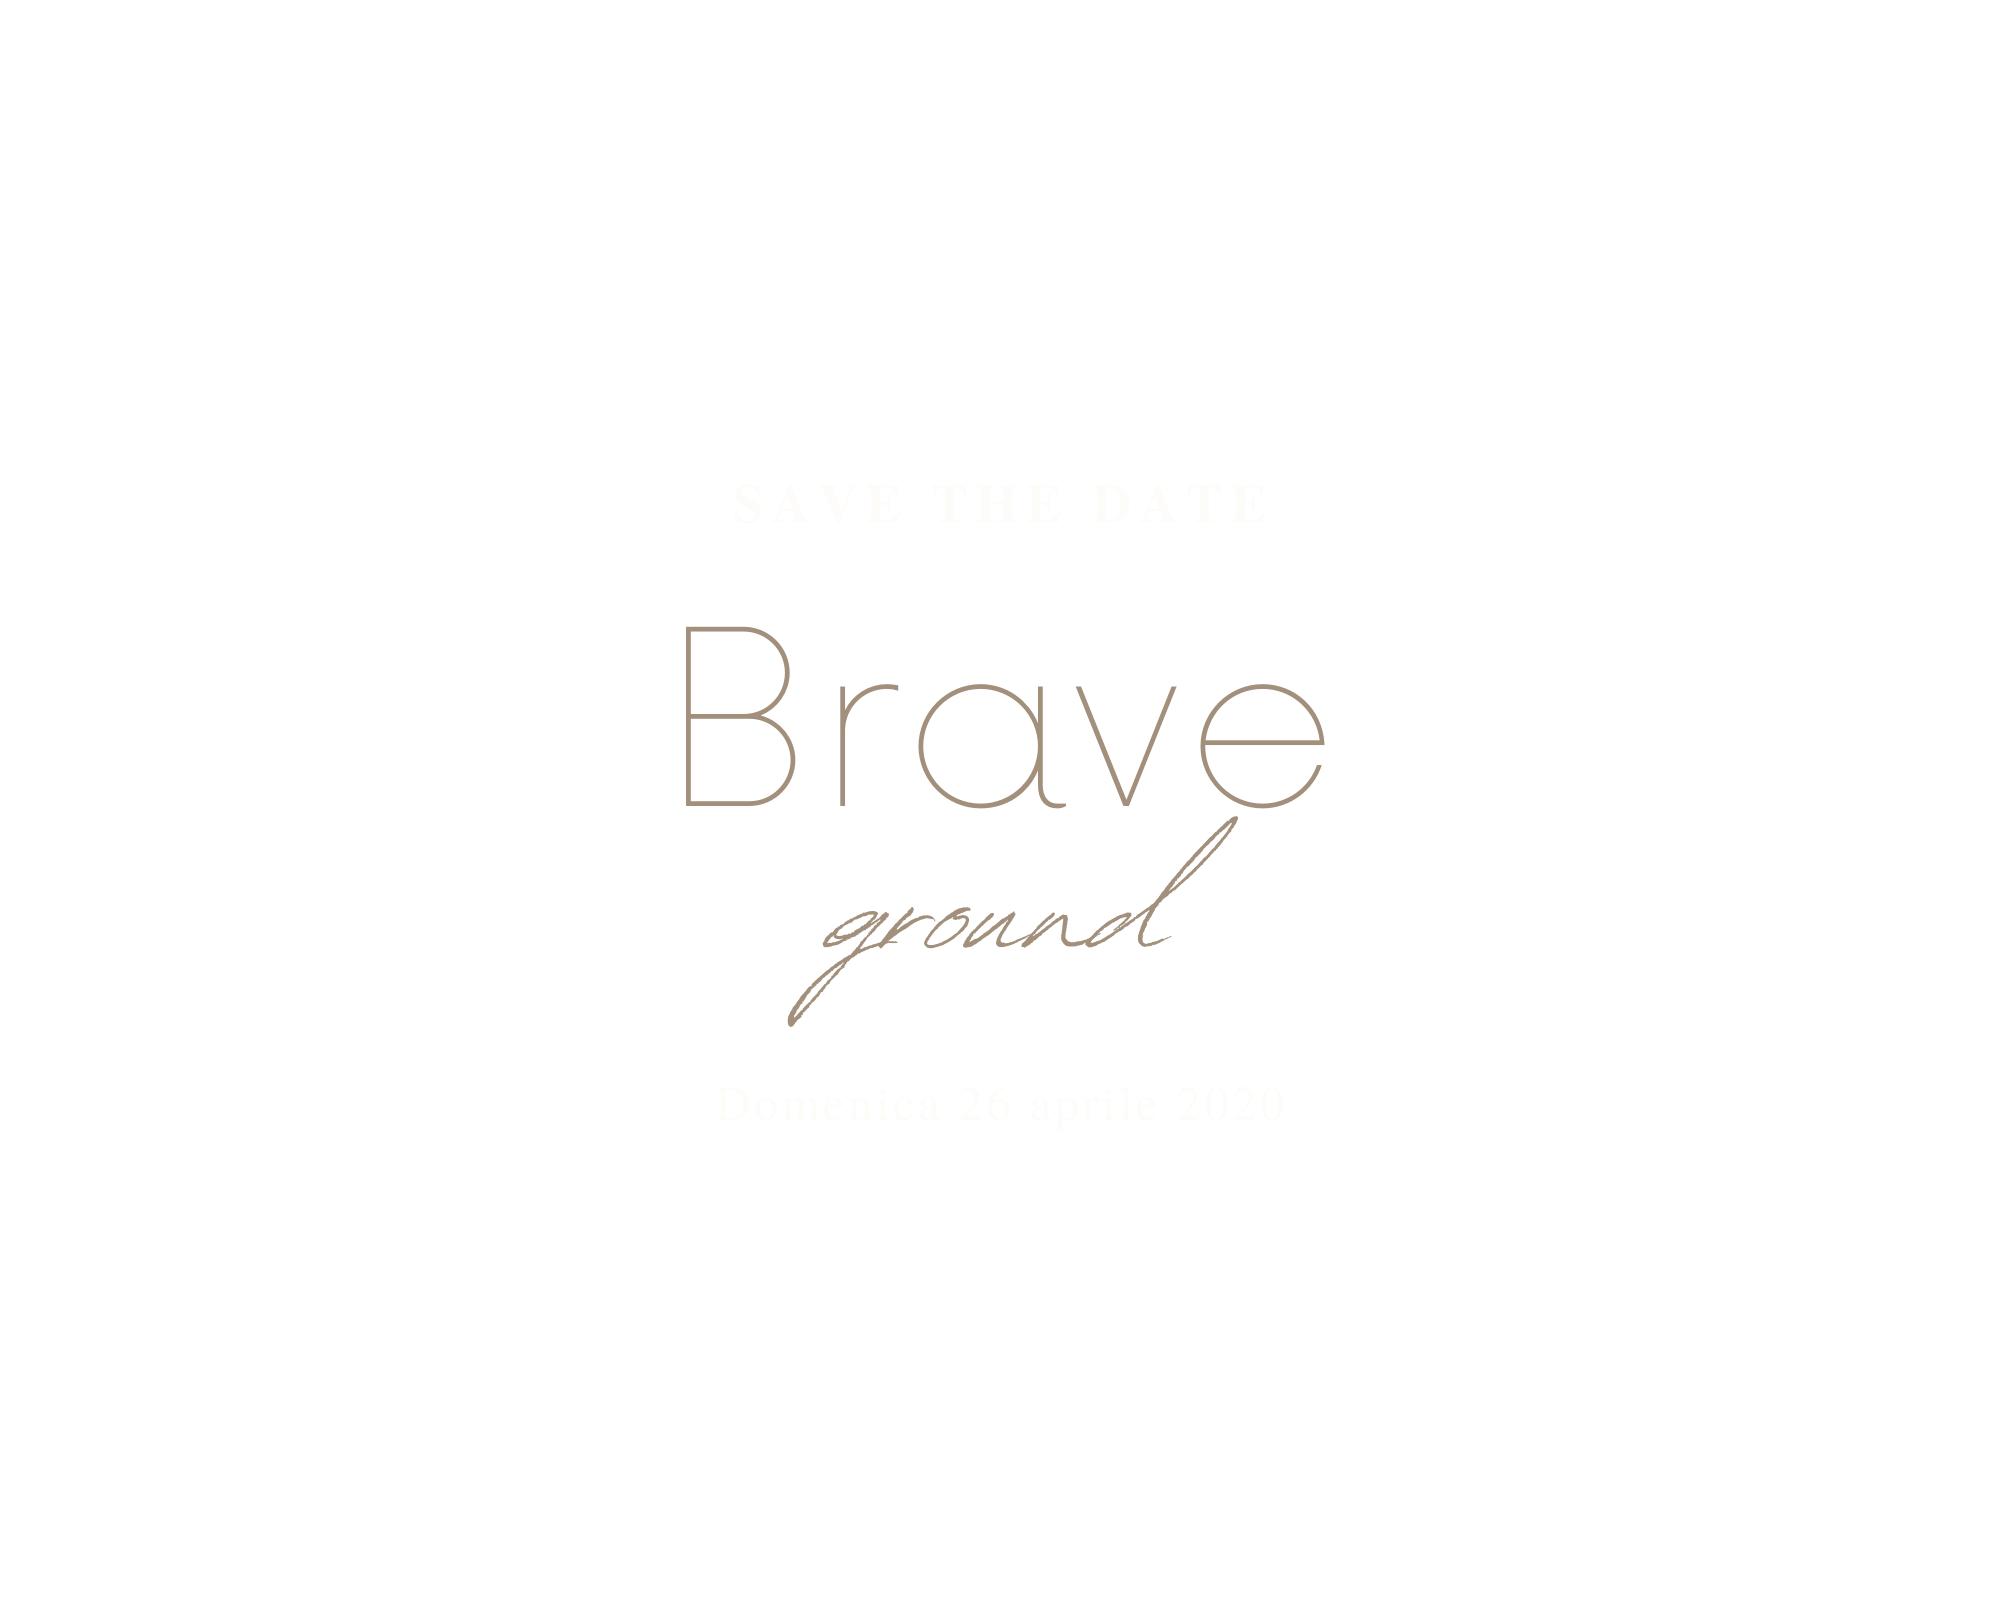 brave-ground-tour-laurorafloreale.it